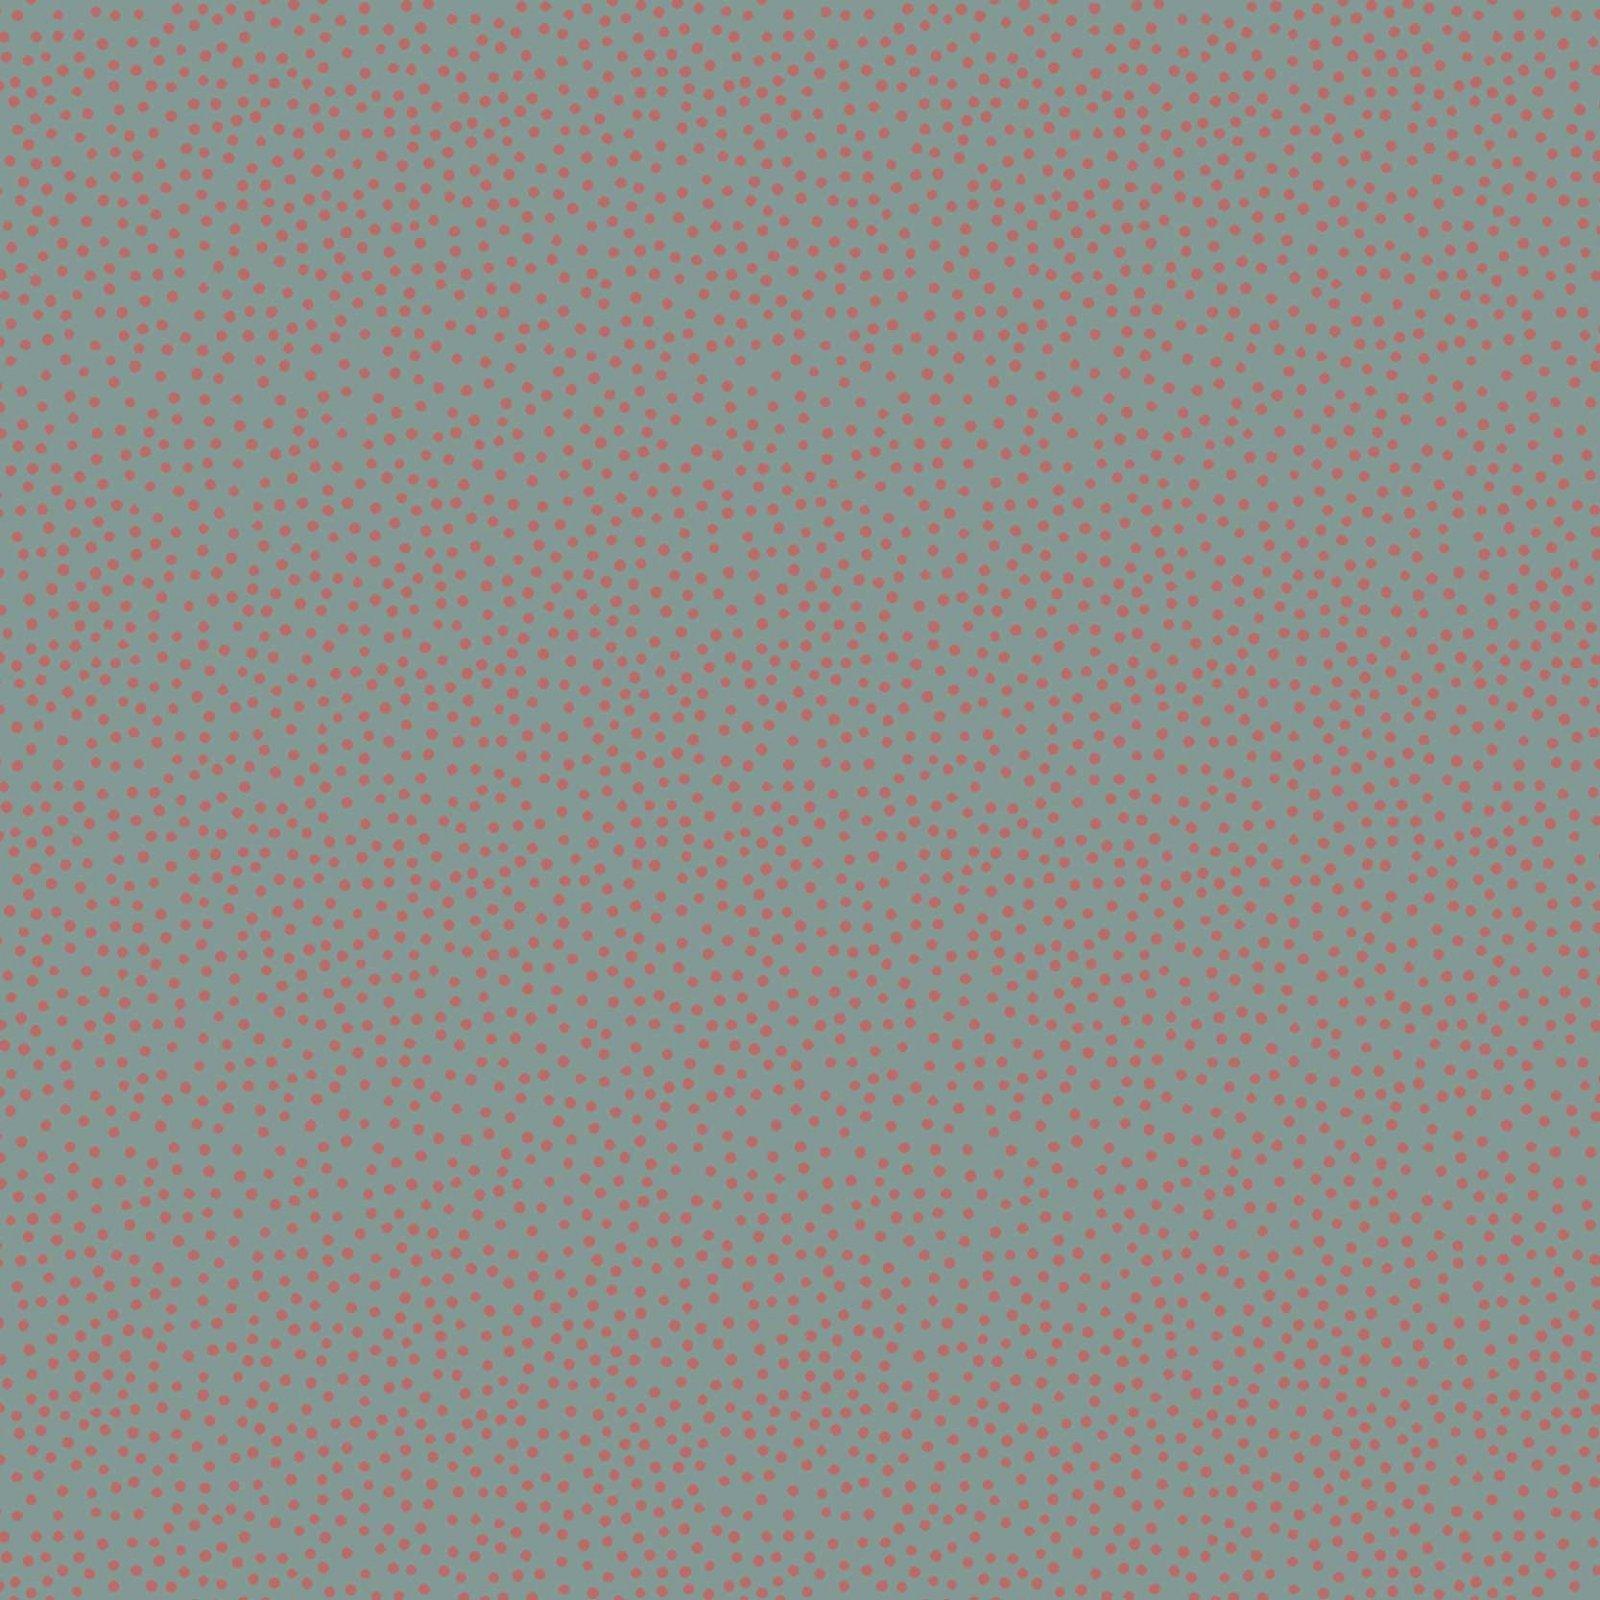 Tilda - Devonstone Collection - Heartstrings Birdhouse - Blue with Brown Spots